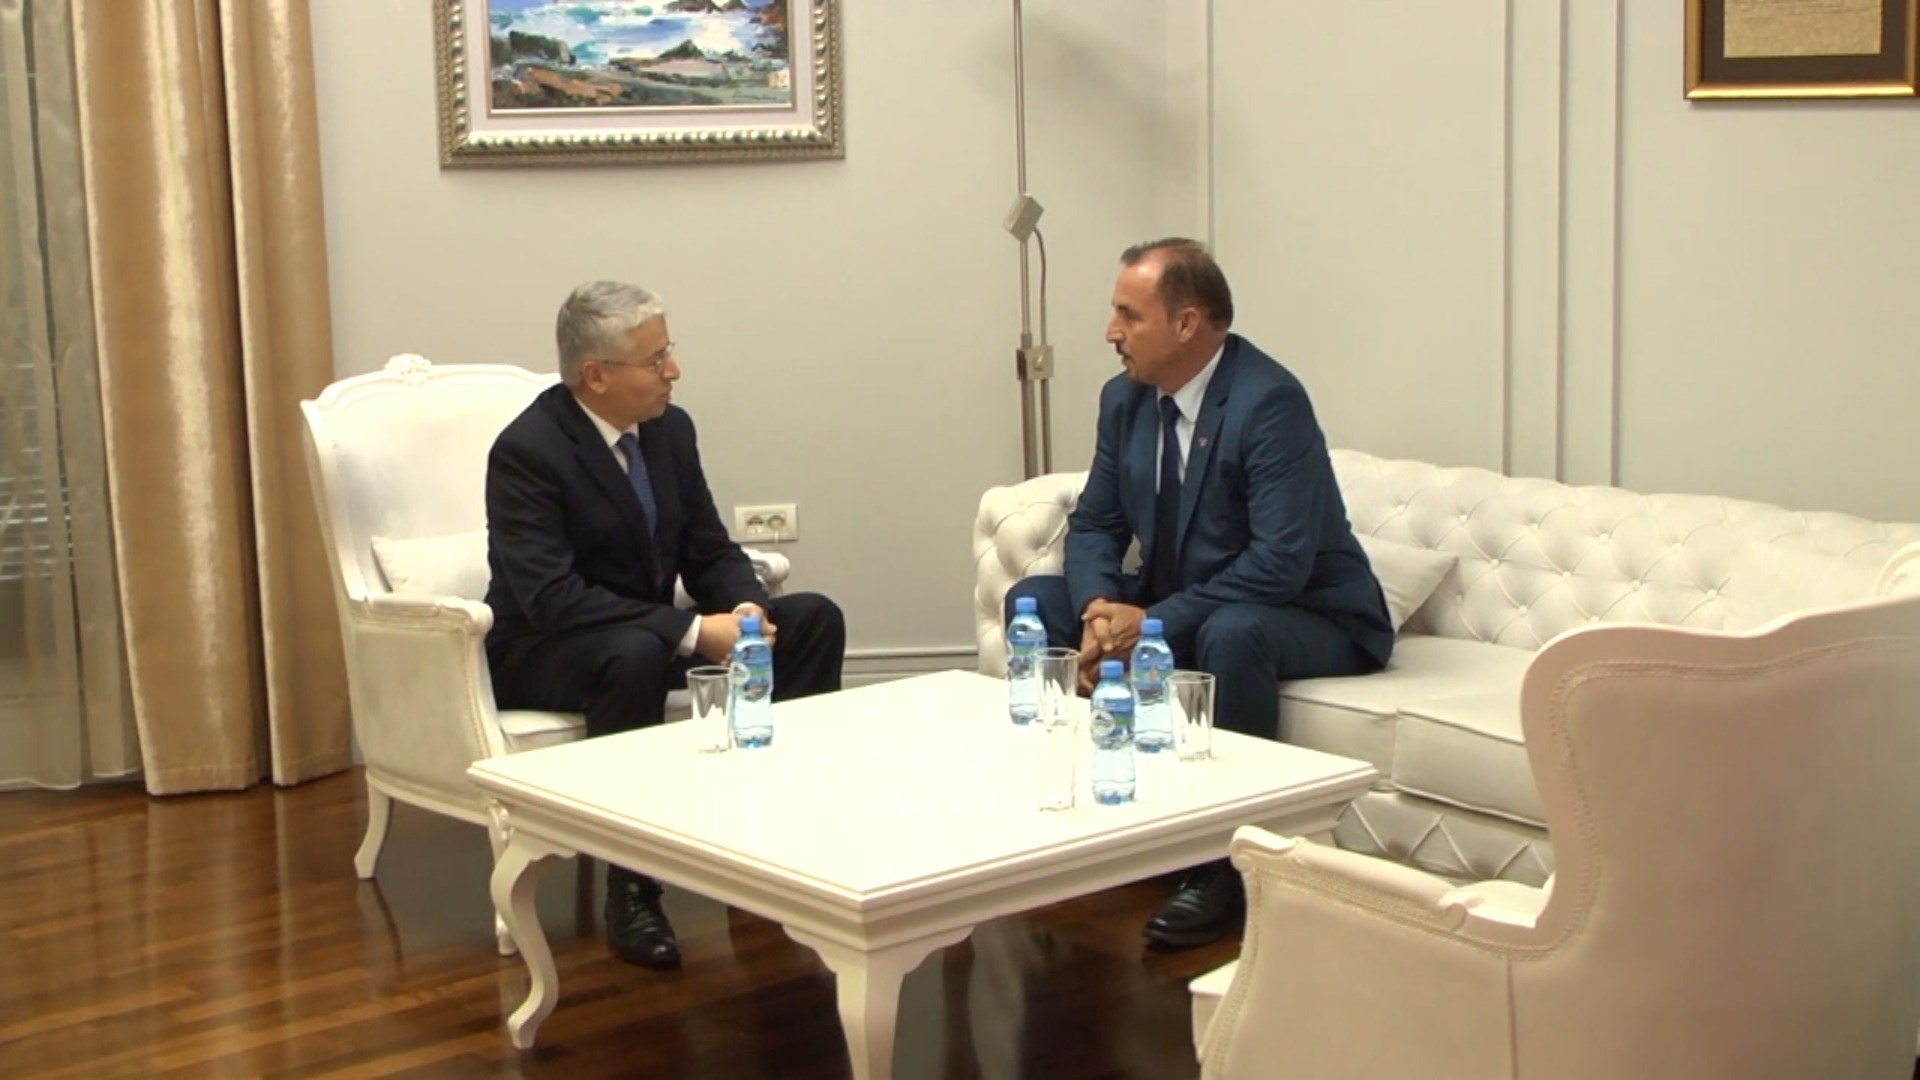 Lleshaj pret homologun e Kosovës Ekrem Mustafa